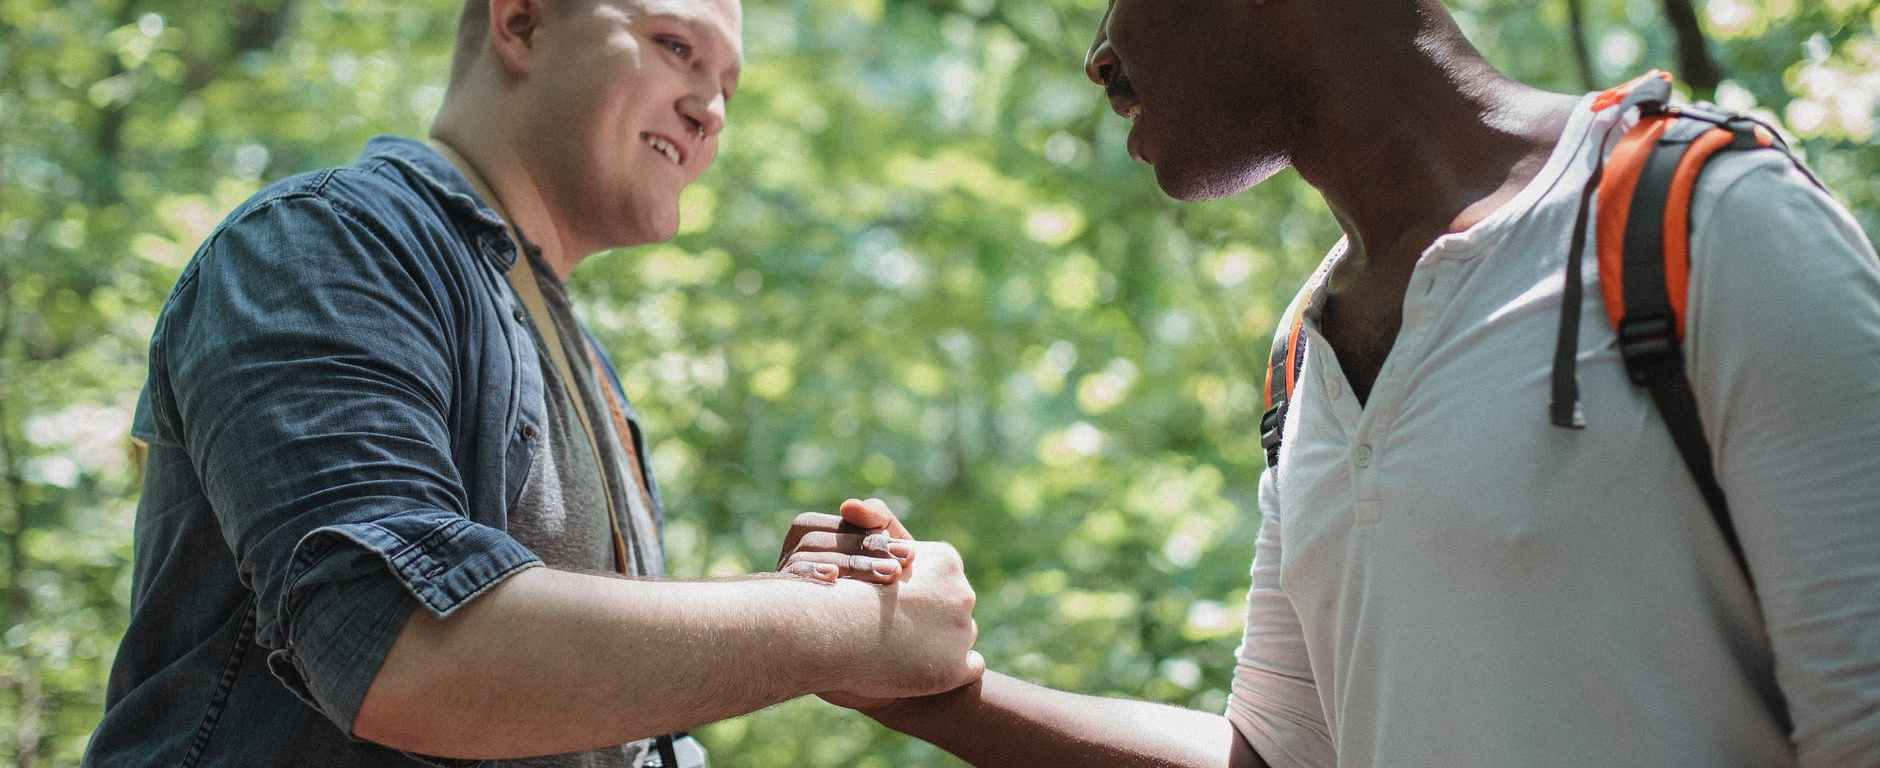 positive multiethnic men shaking hands in forest